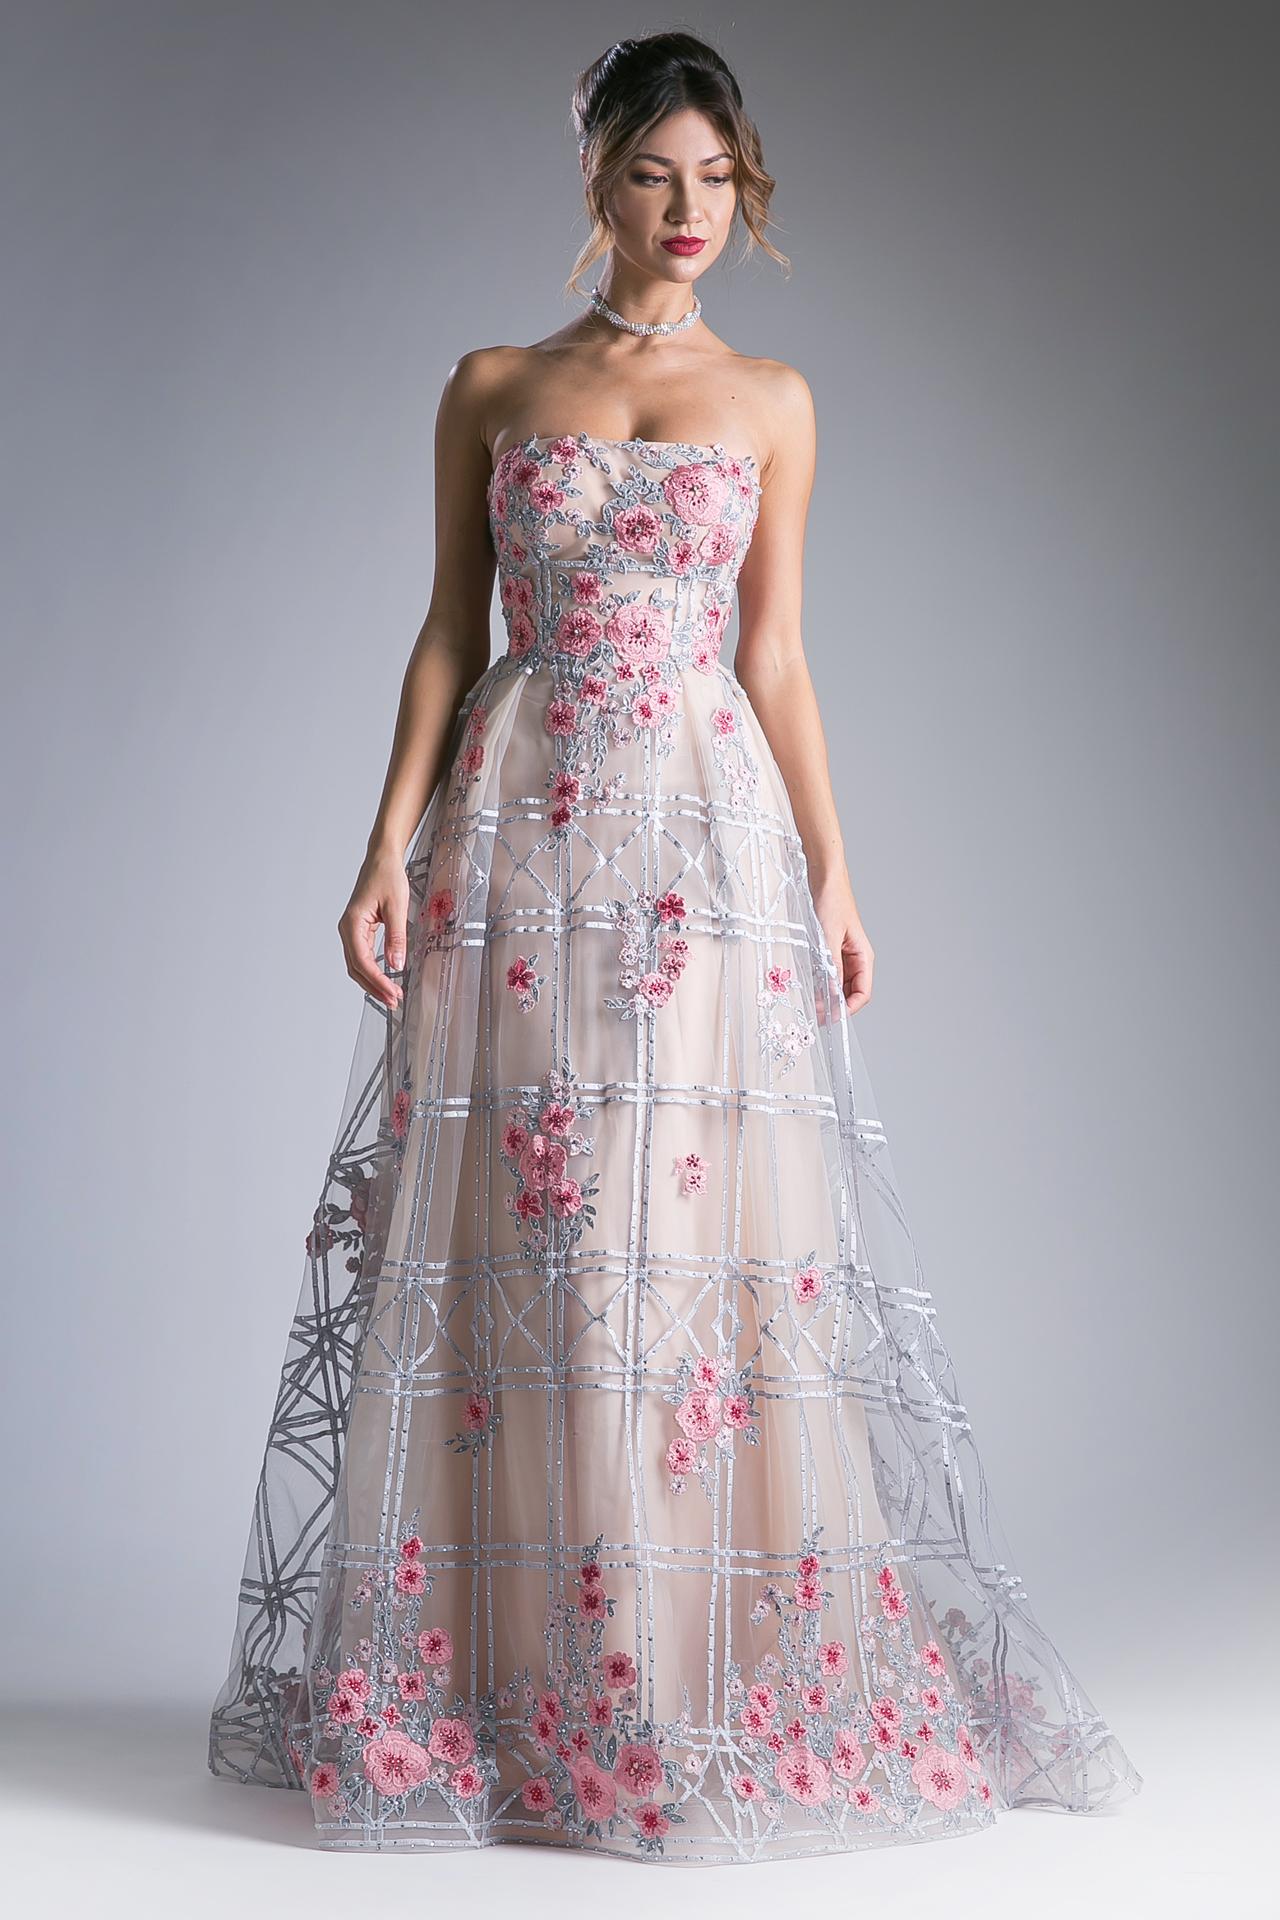 Nové spoločenské šaty :) - Obrázok č. 8